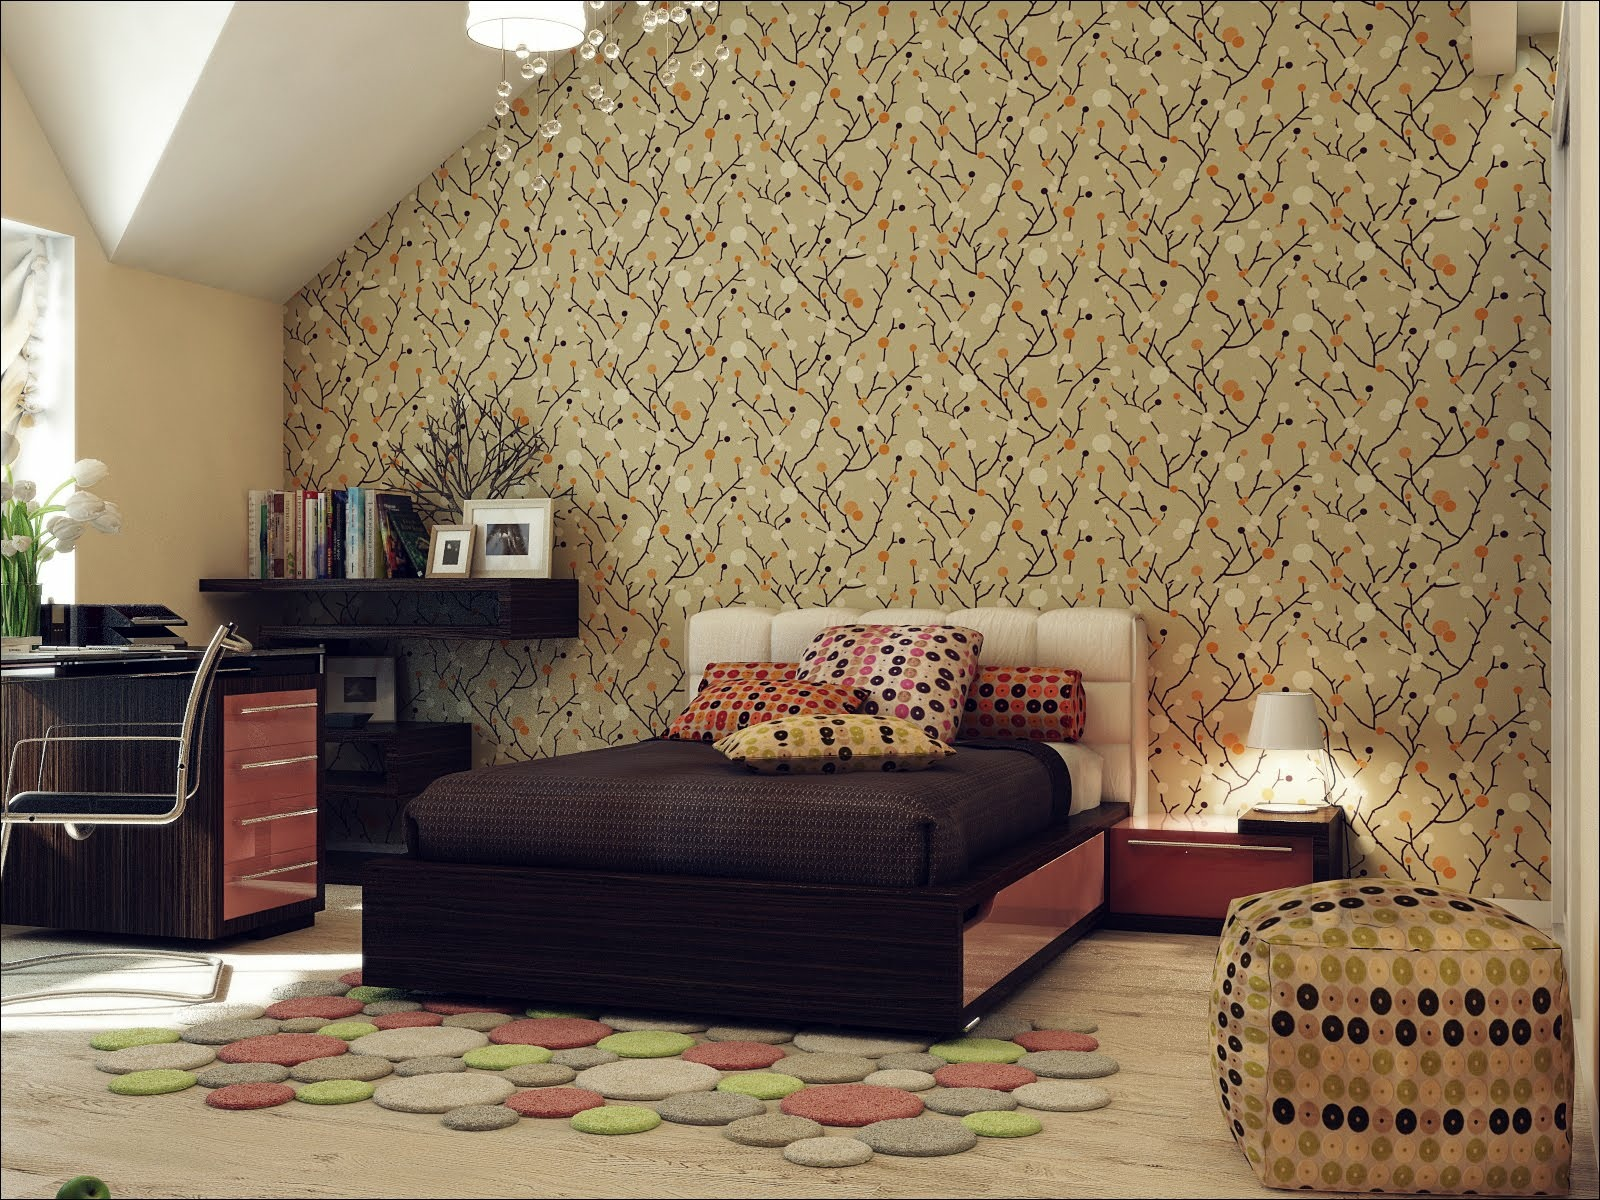 Bedroom Wallpaper Malaysia Bedroom 1600x1200